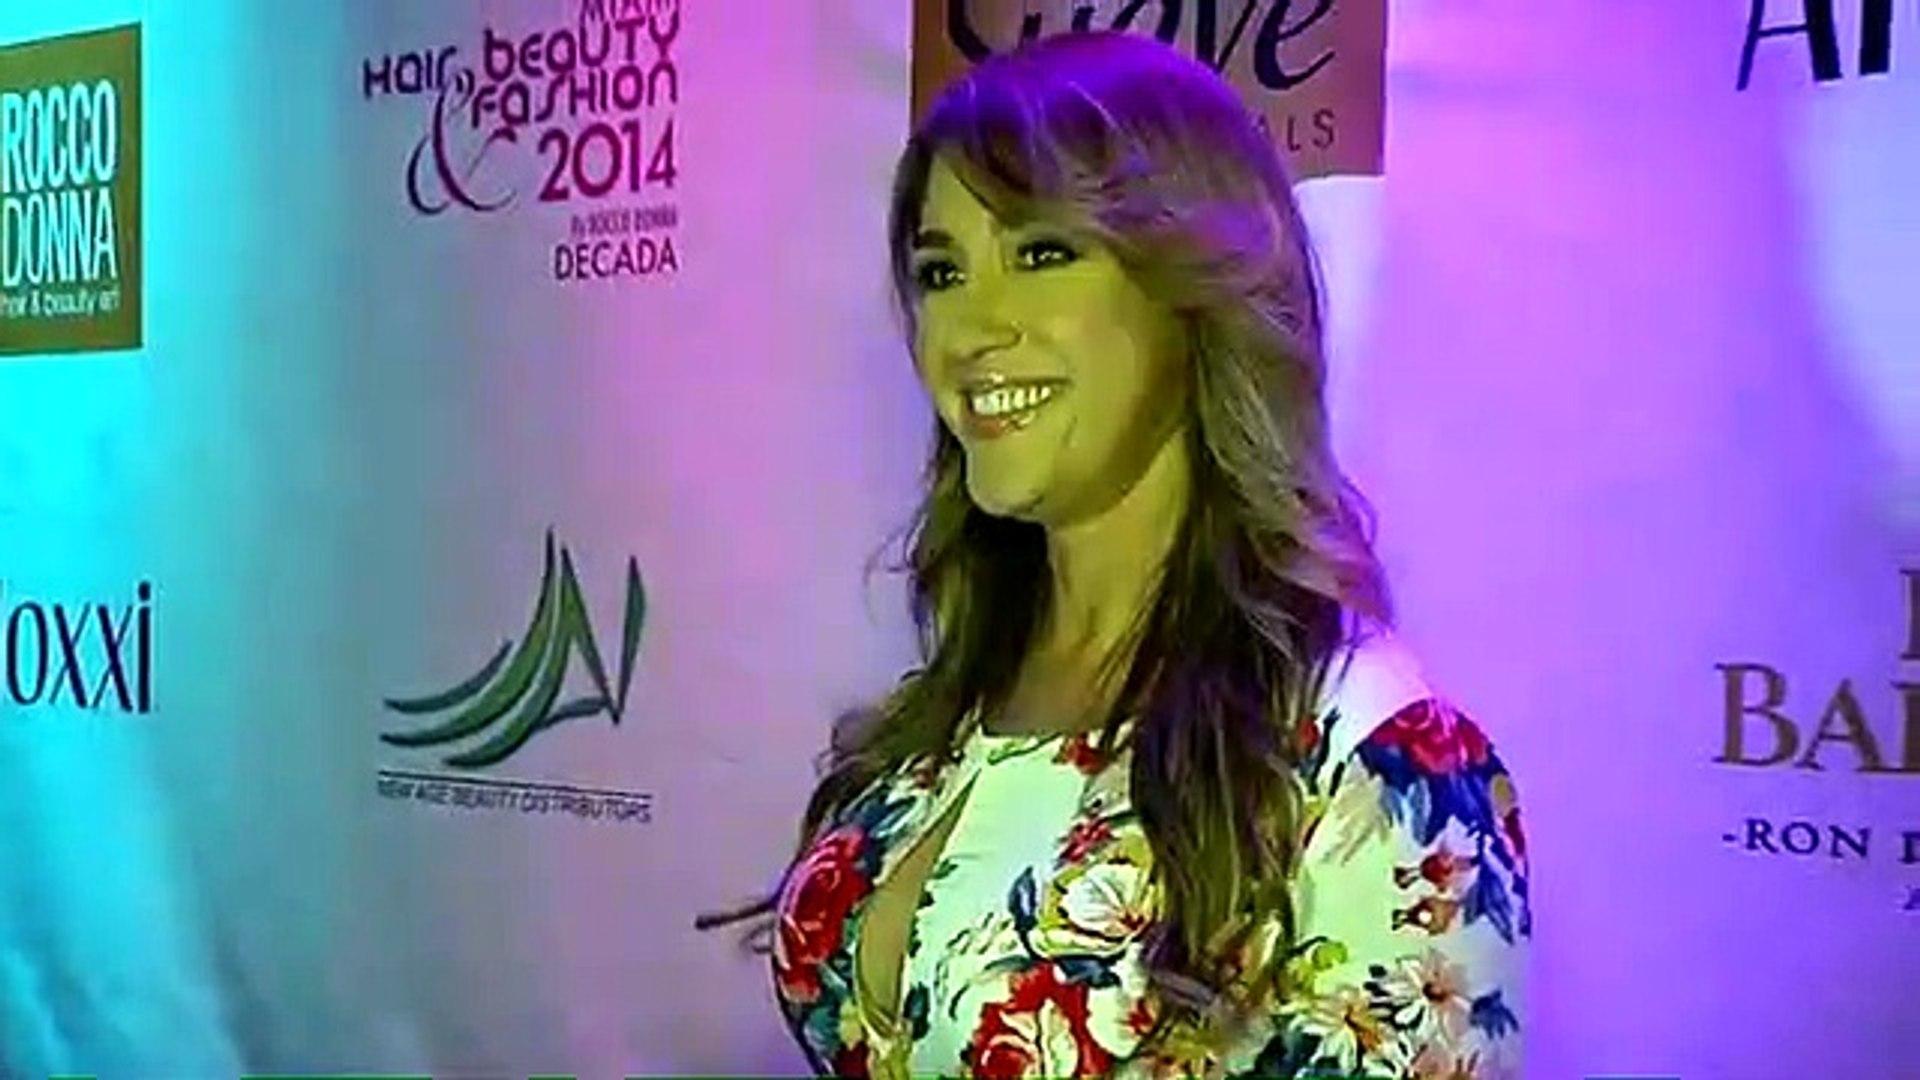 Miami Hair and Beauty Fashion - Rocco Donna & Sachamama